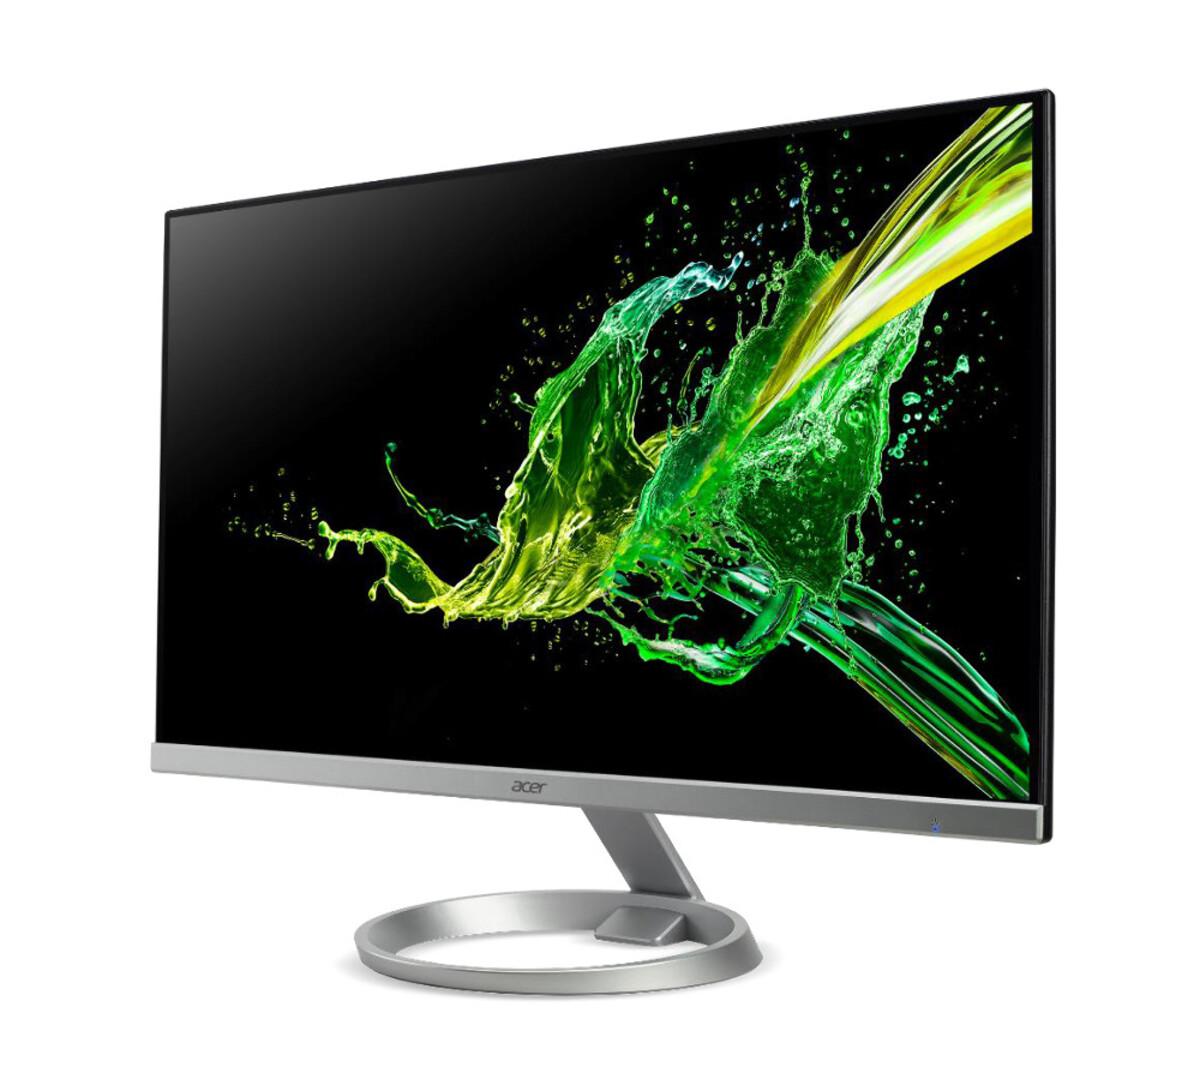 Bild 3 von ACER R270SI silber Gaming-Monitor (E, 27 Zoll, Full-HD 1920 x 1080 Pixel, IPS, 16:9, 1 ms Reaktionszeit, HDMI, Zero Frame, FreeSync)